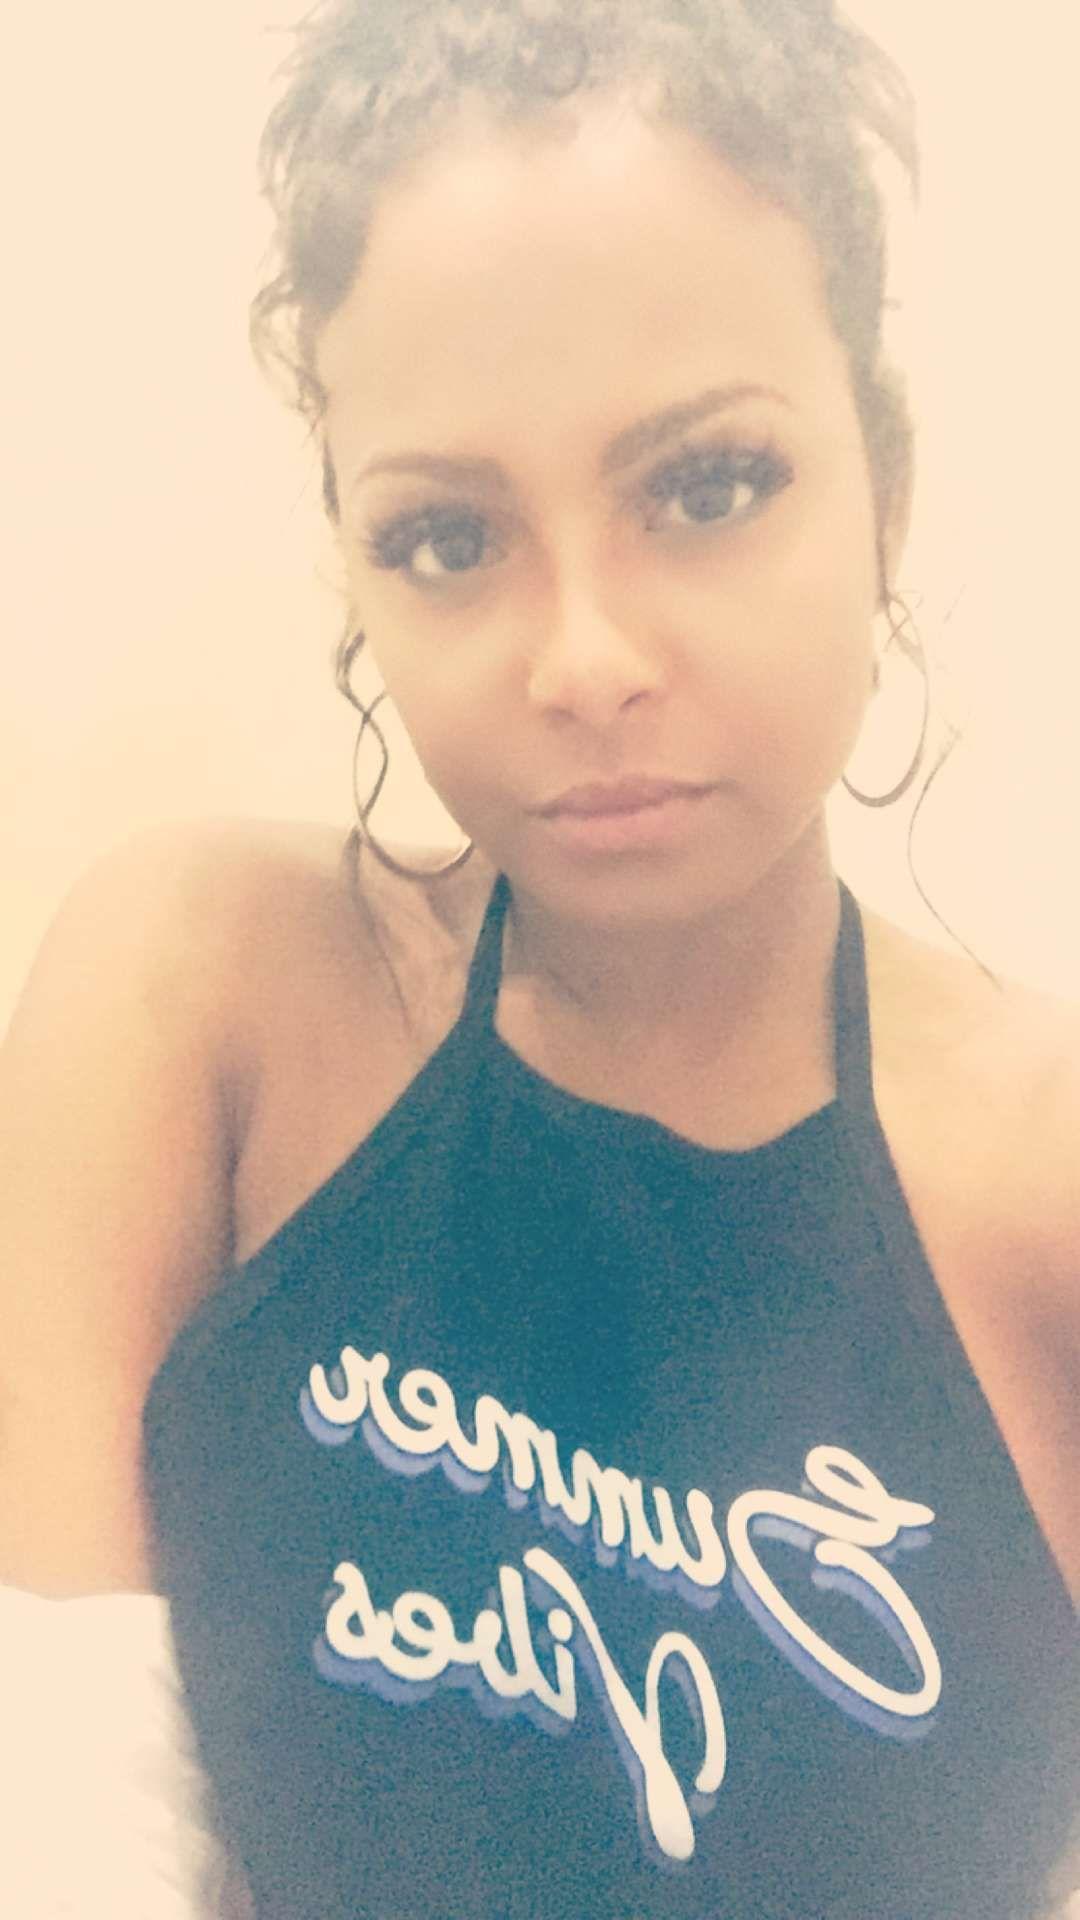 Christina-Milian-Nipple-Slip-Snapchat-8